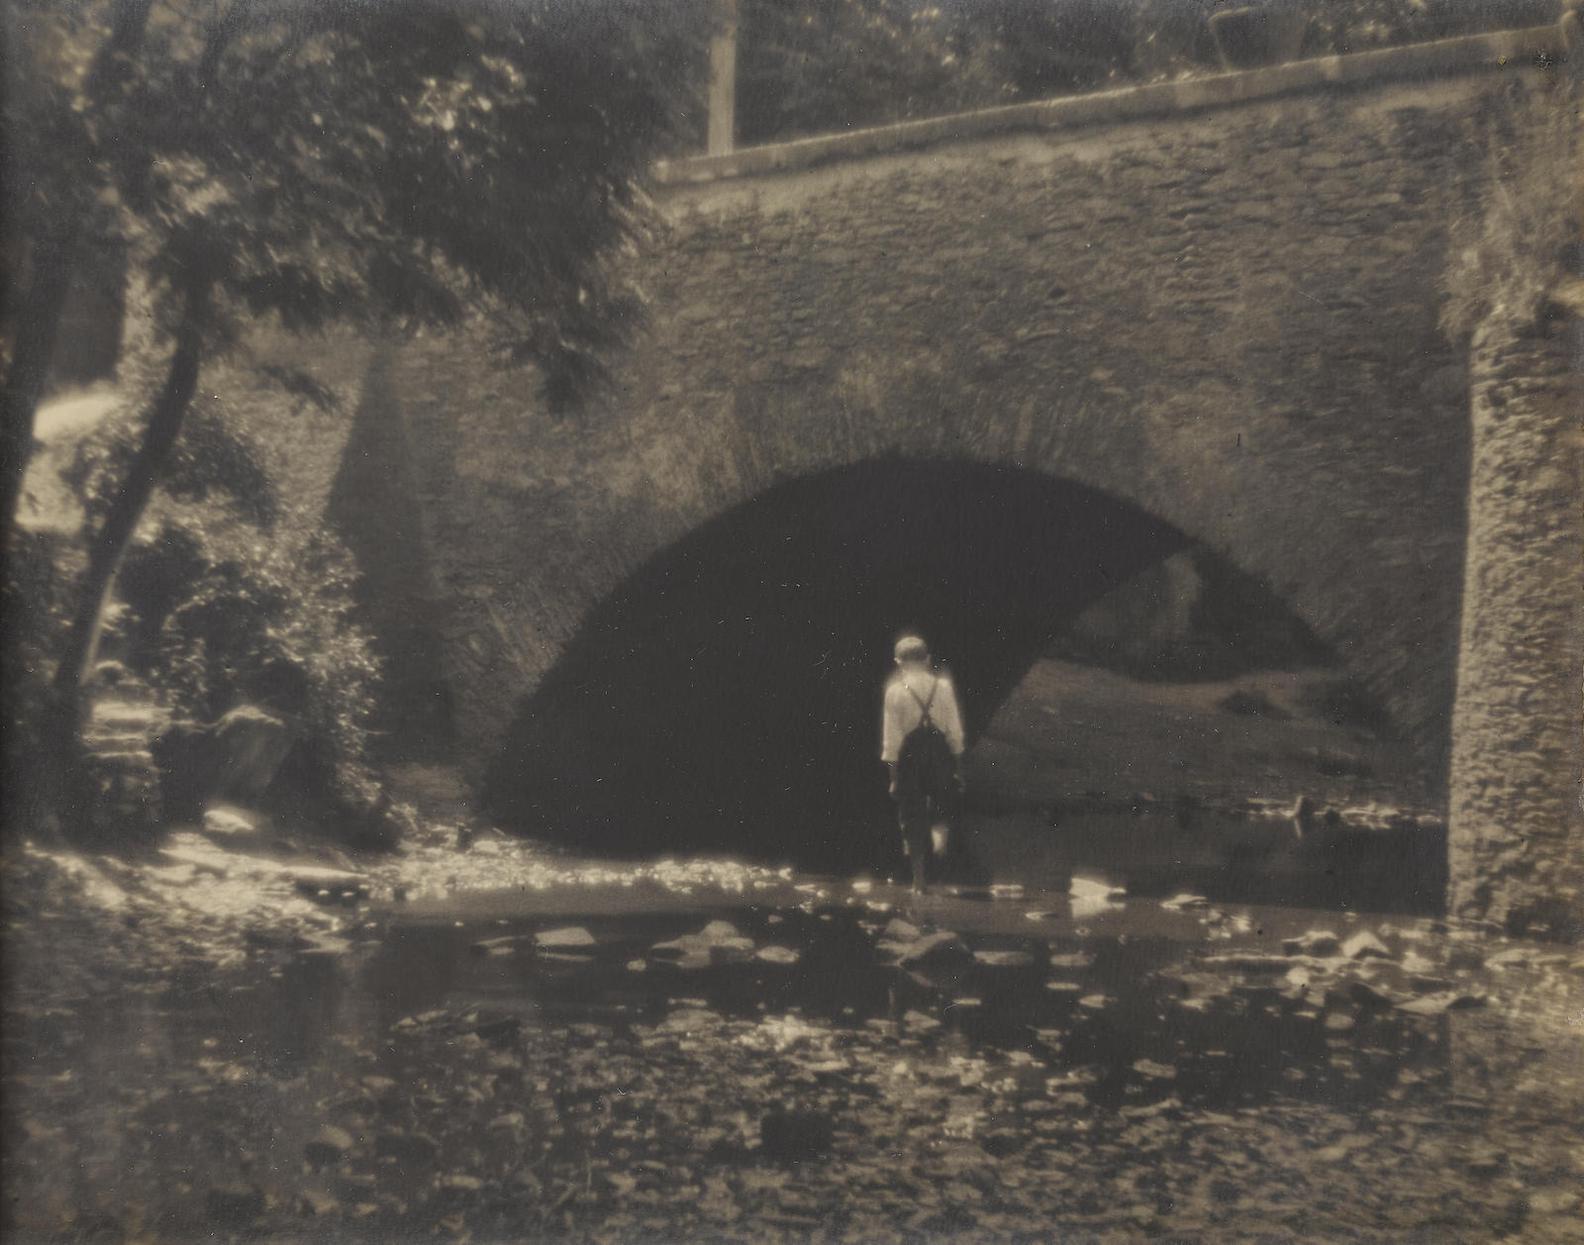 Josef Sudek-Untitled (Boy Crossing Stream)-1925